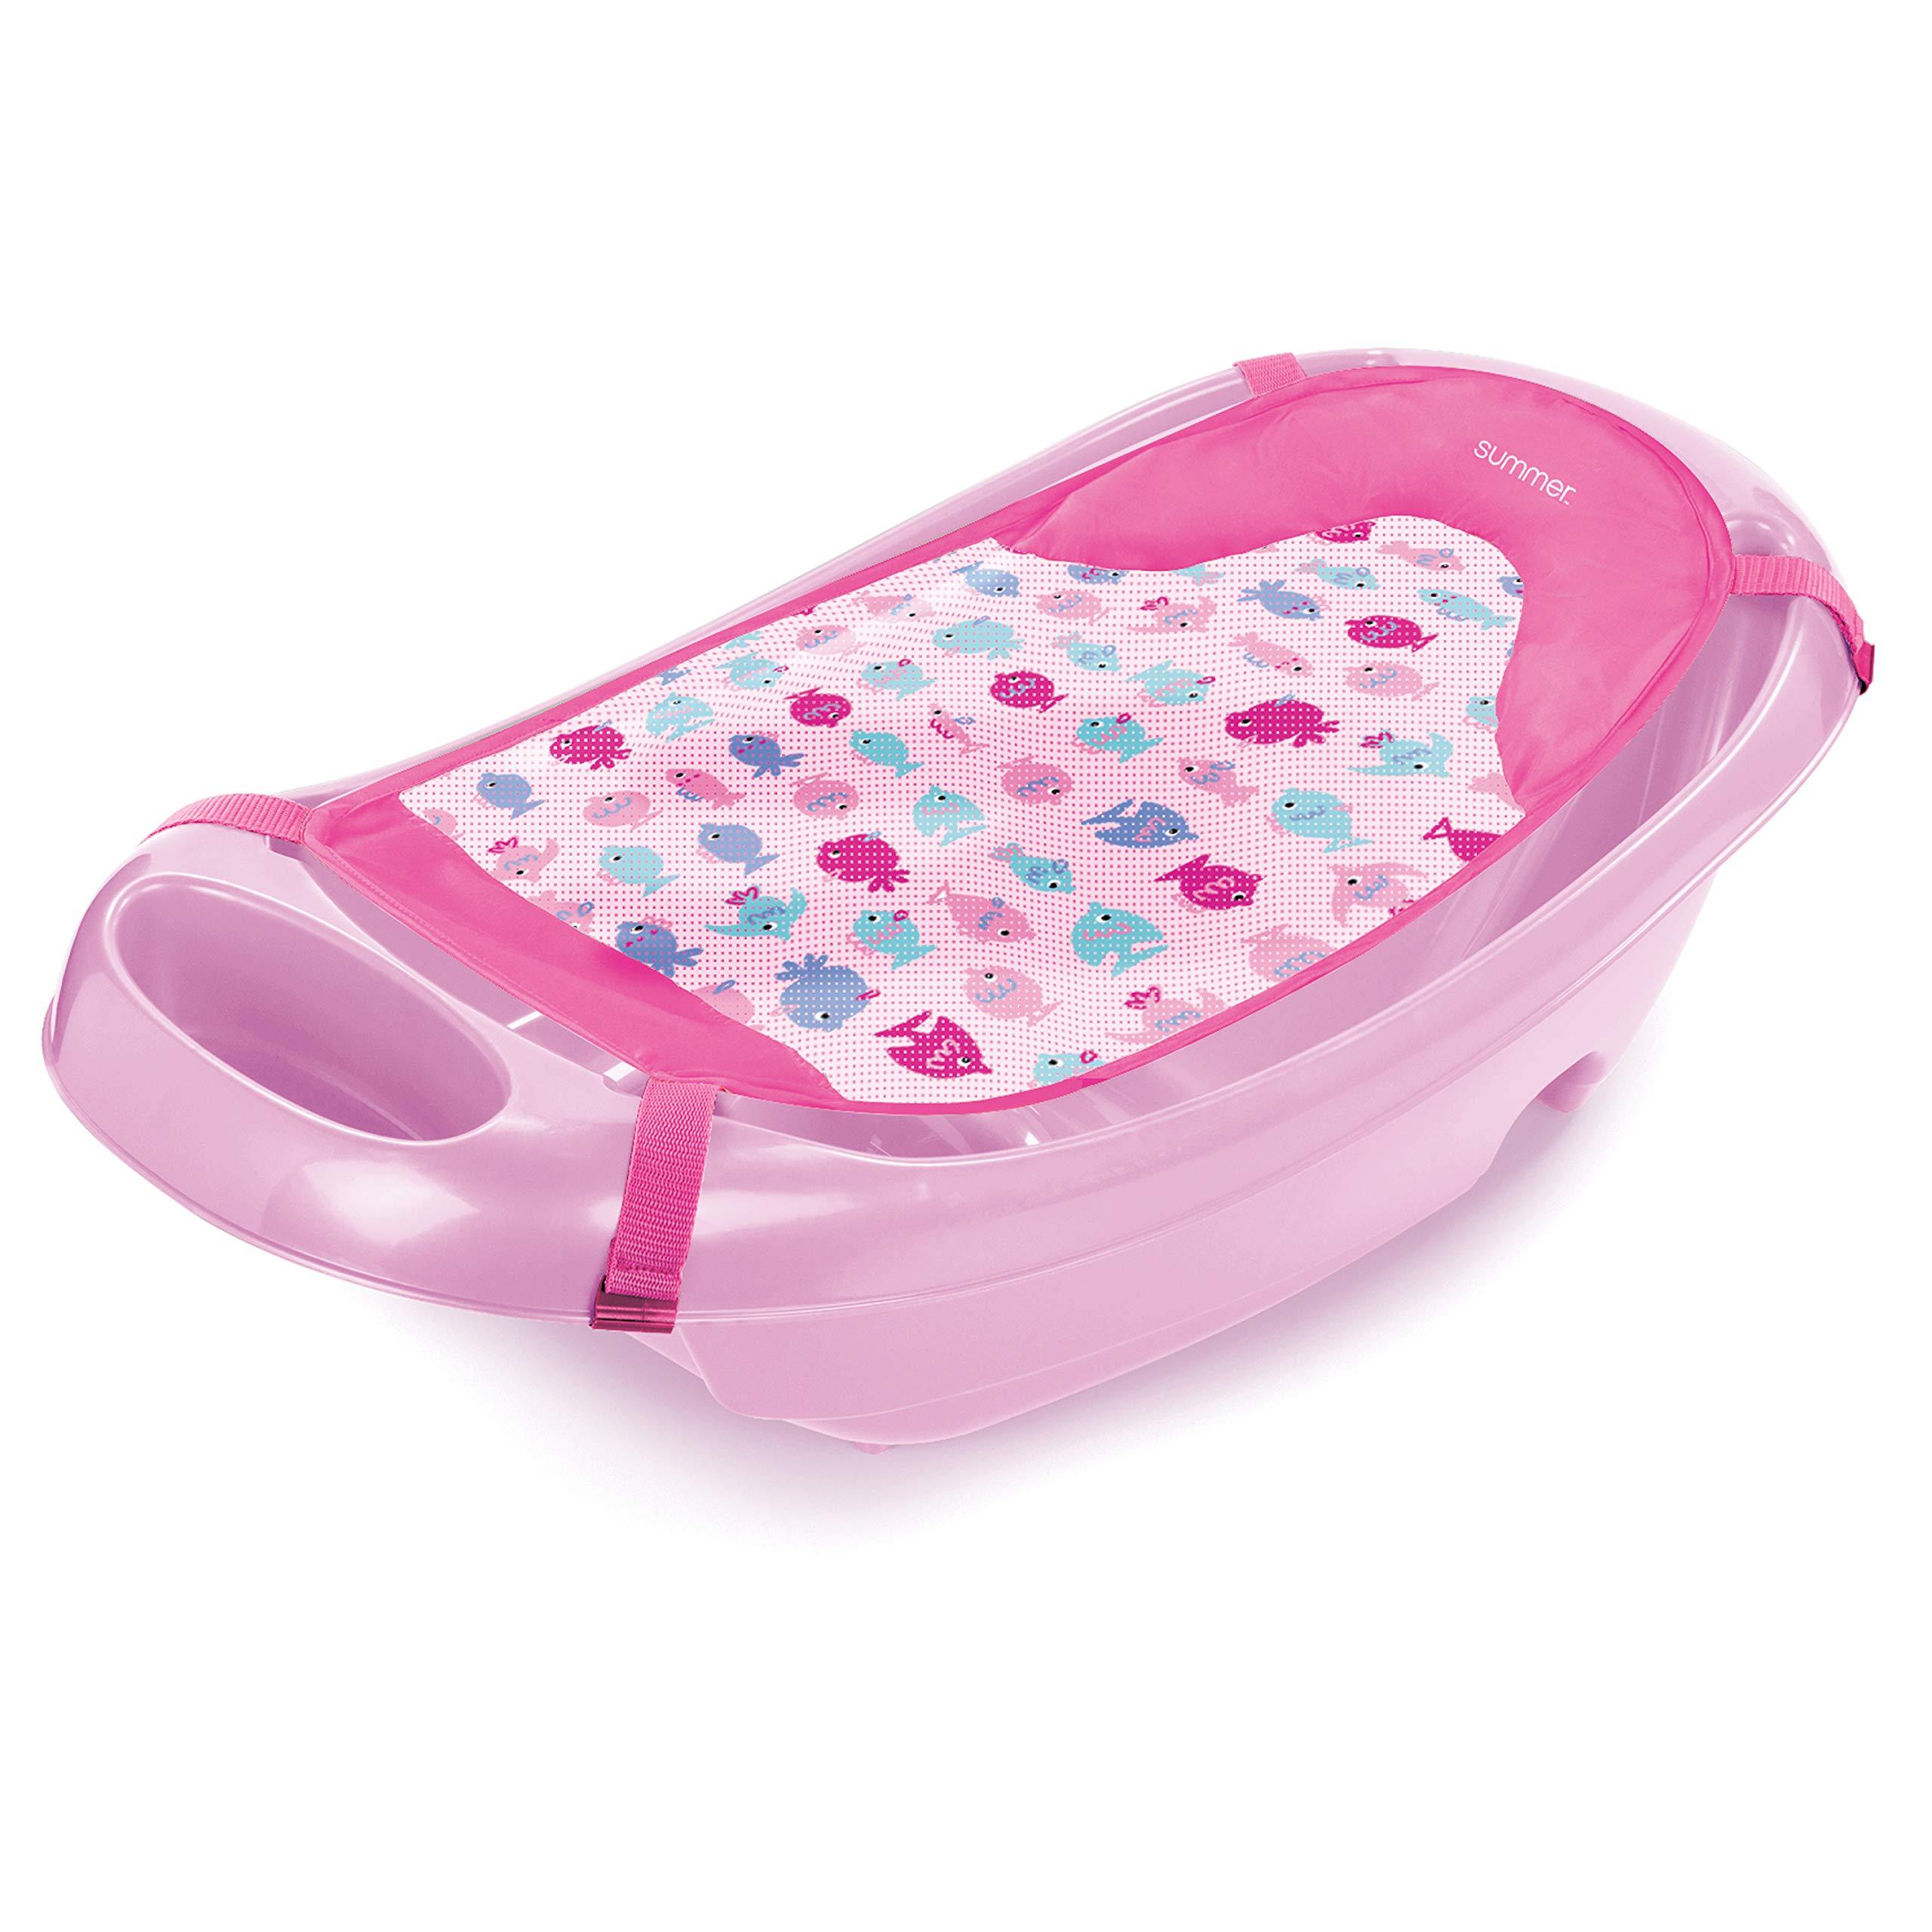 Summer Infant Summer Splish 'N Splash Newborn to